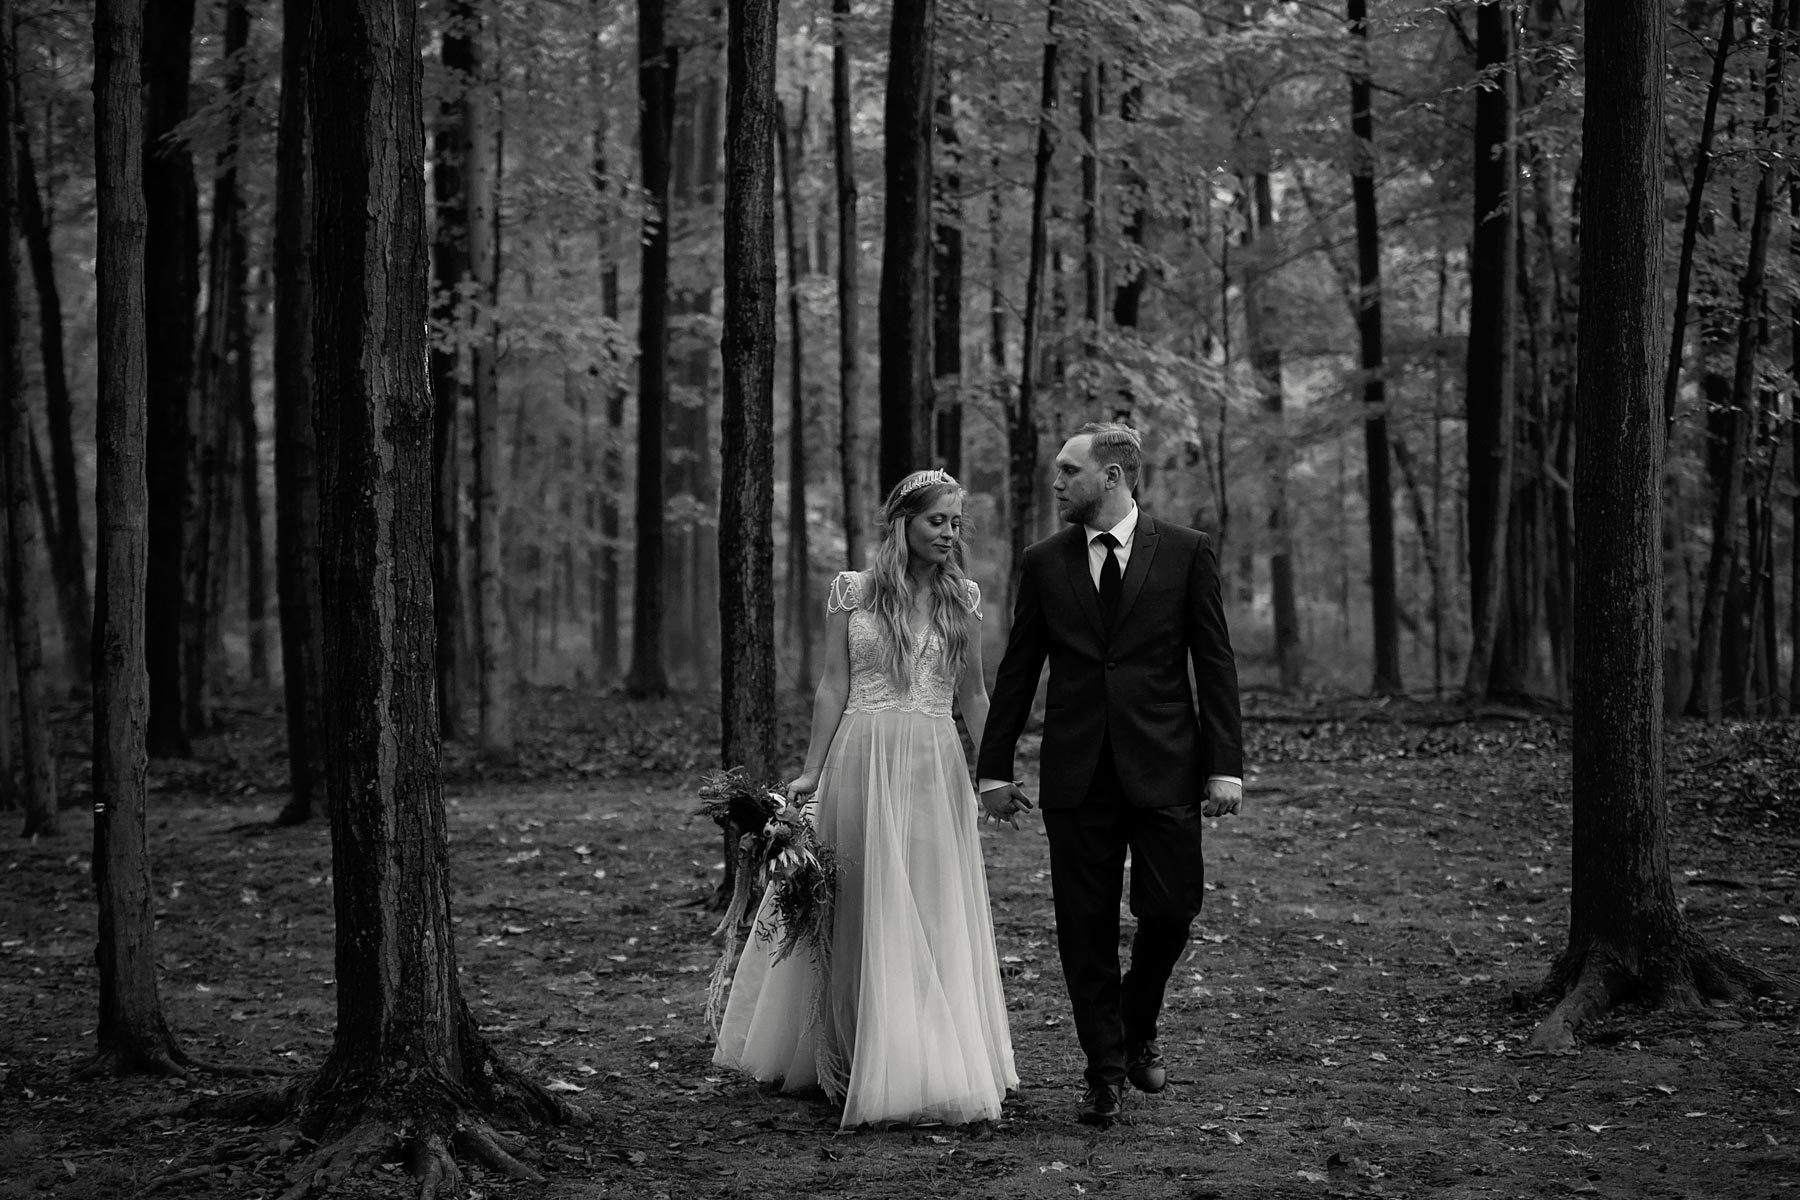 Bucks_County_wedding_photographer_Stroudsmoor_country_inn_wedding_Philadelphia_wedding_photographer_26_fairy_inspired_wedding_stroudsmoor.JPG